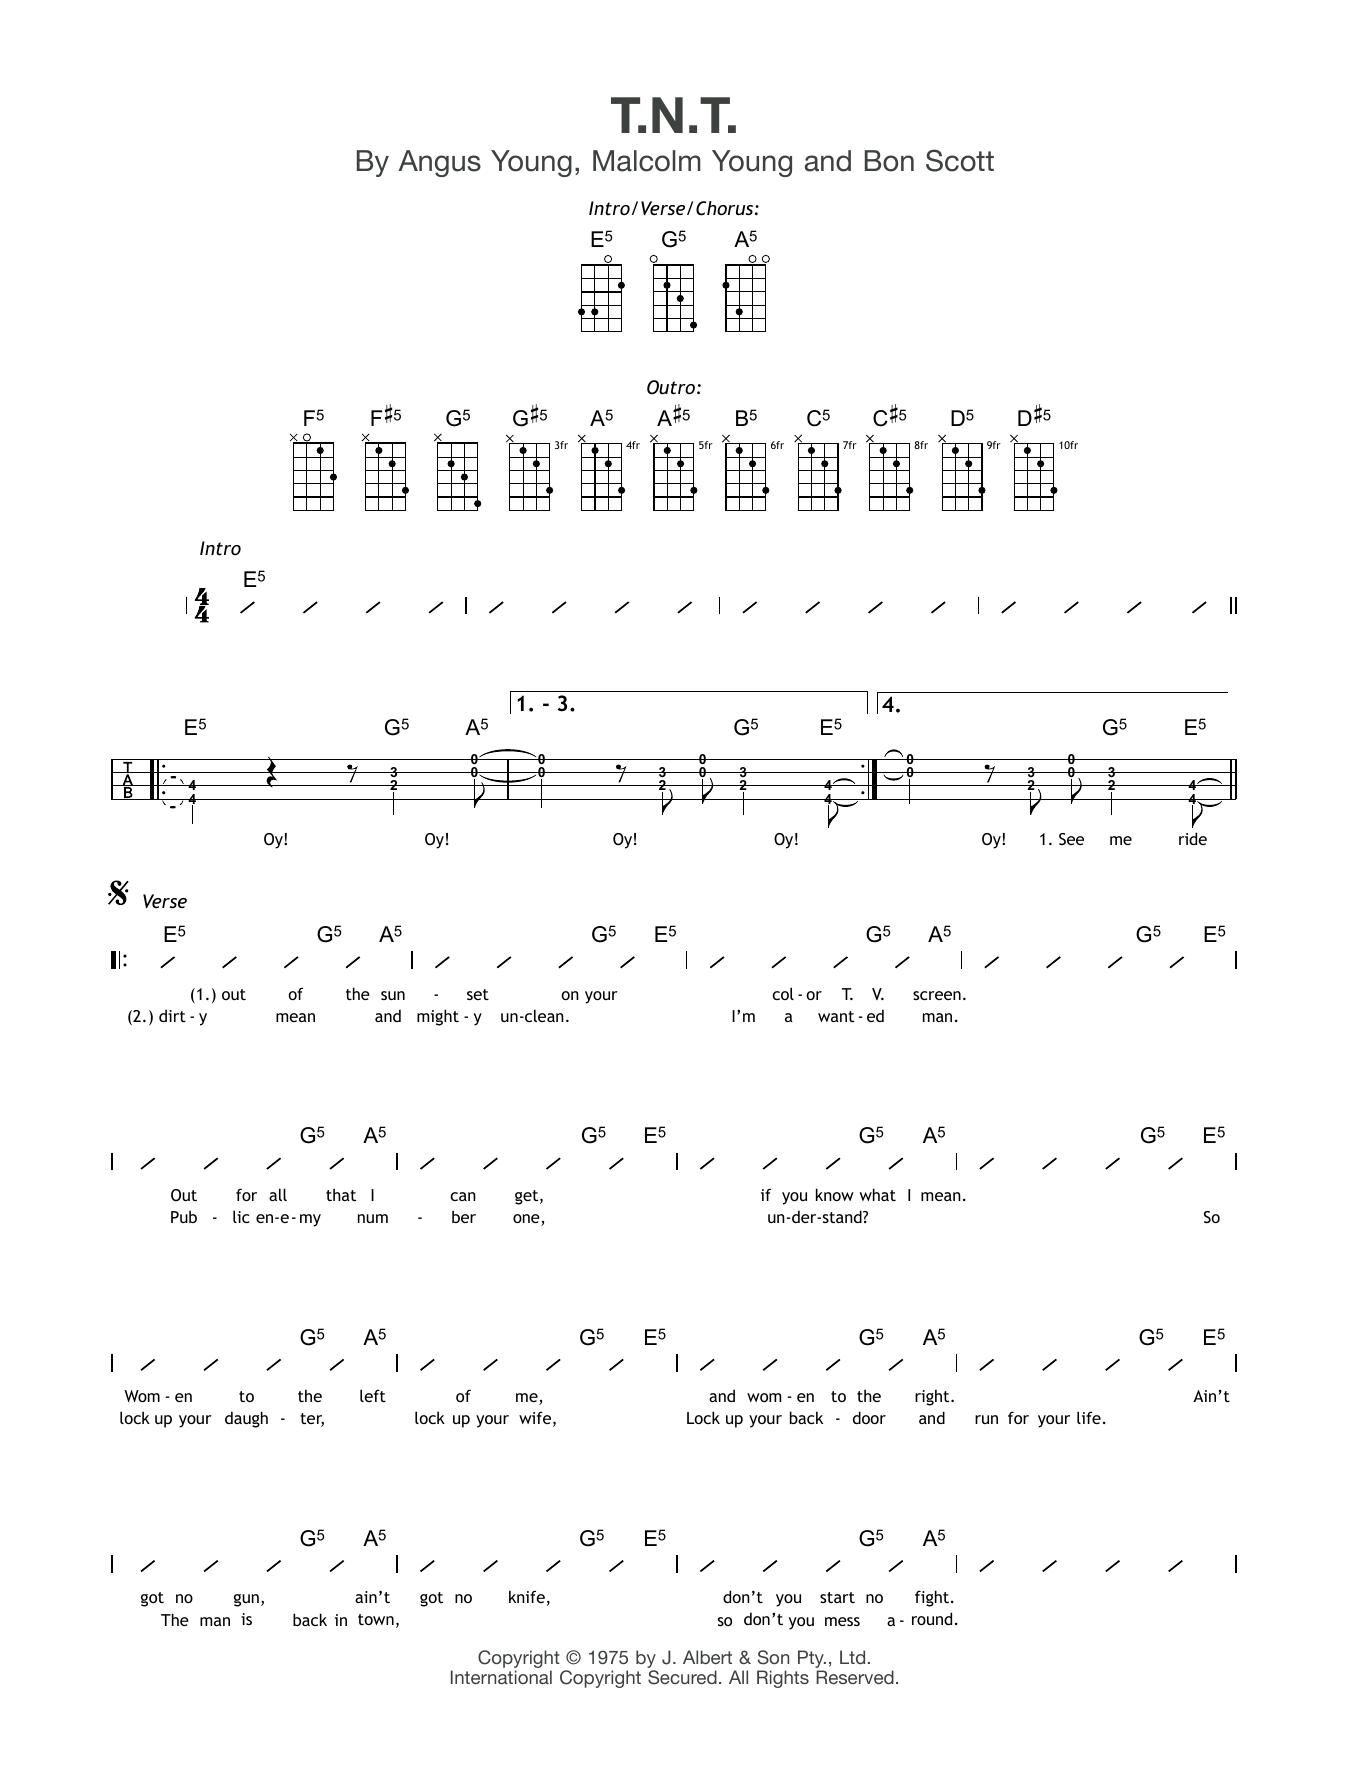 T.N.T. Sheet Music